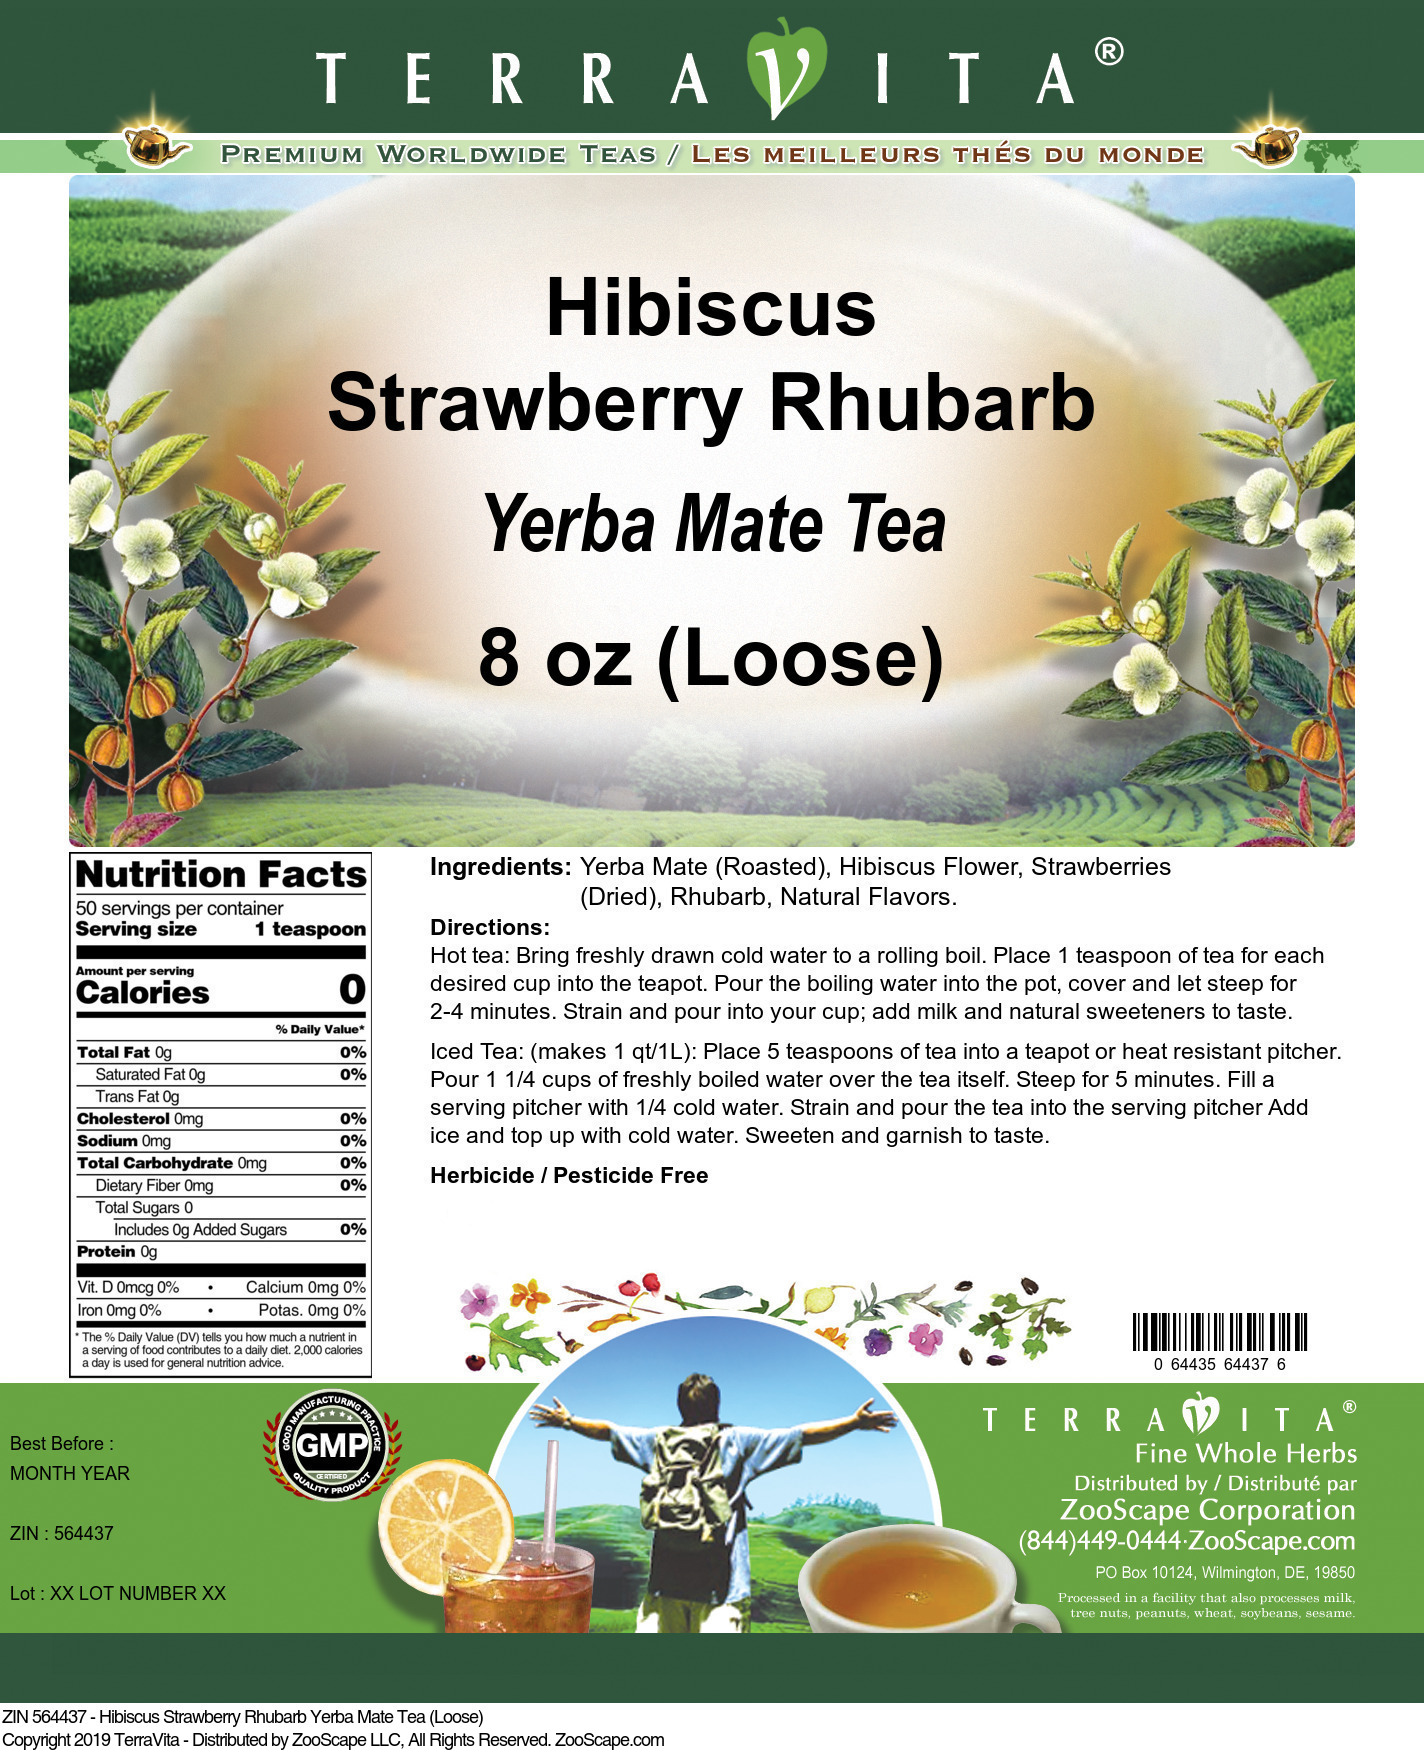 Hibiscus Strawberry Rhubarb Yerba Mate Tea (Loose)